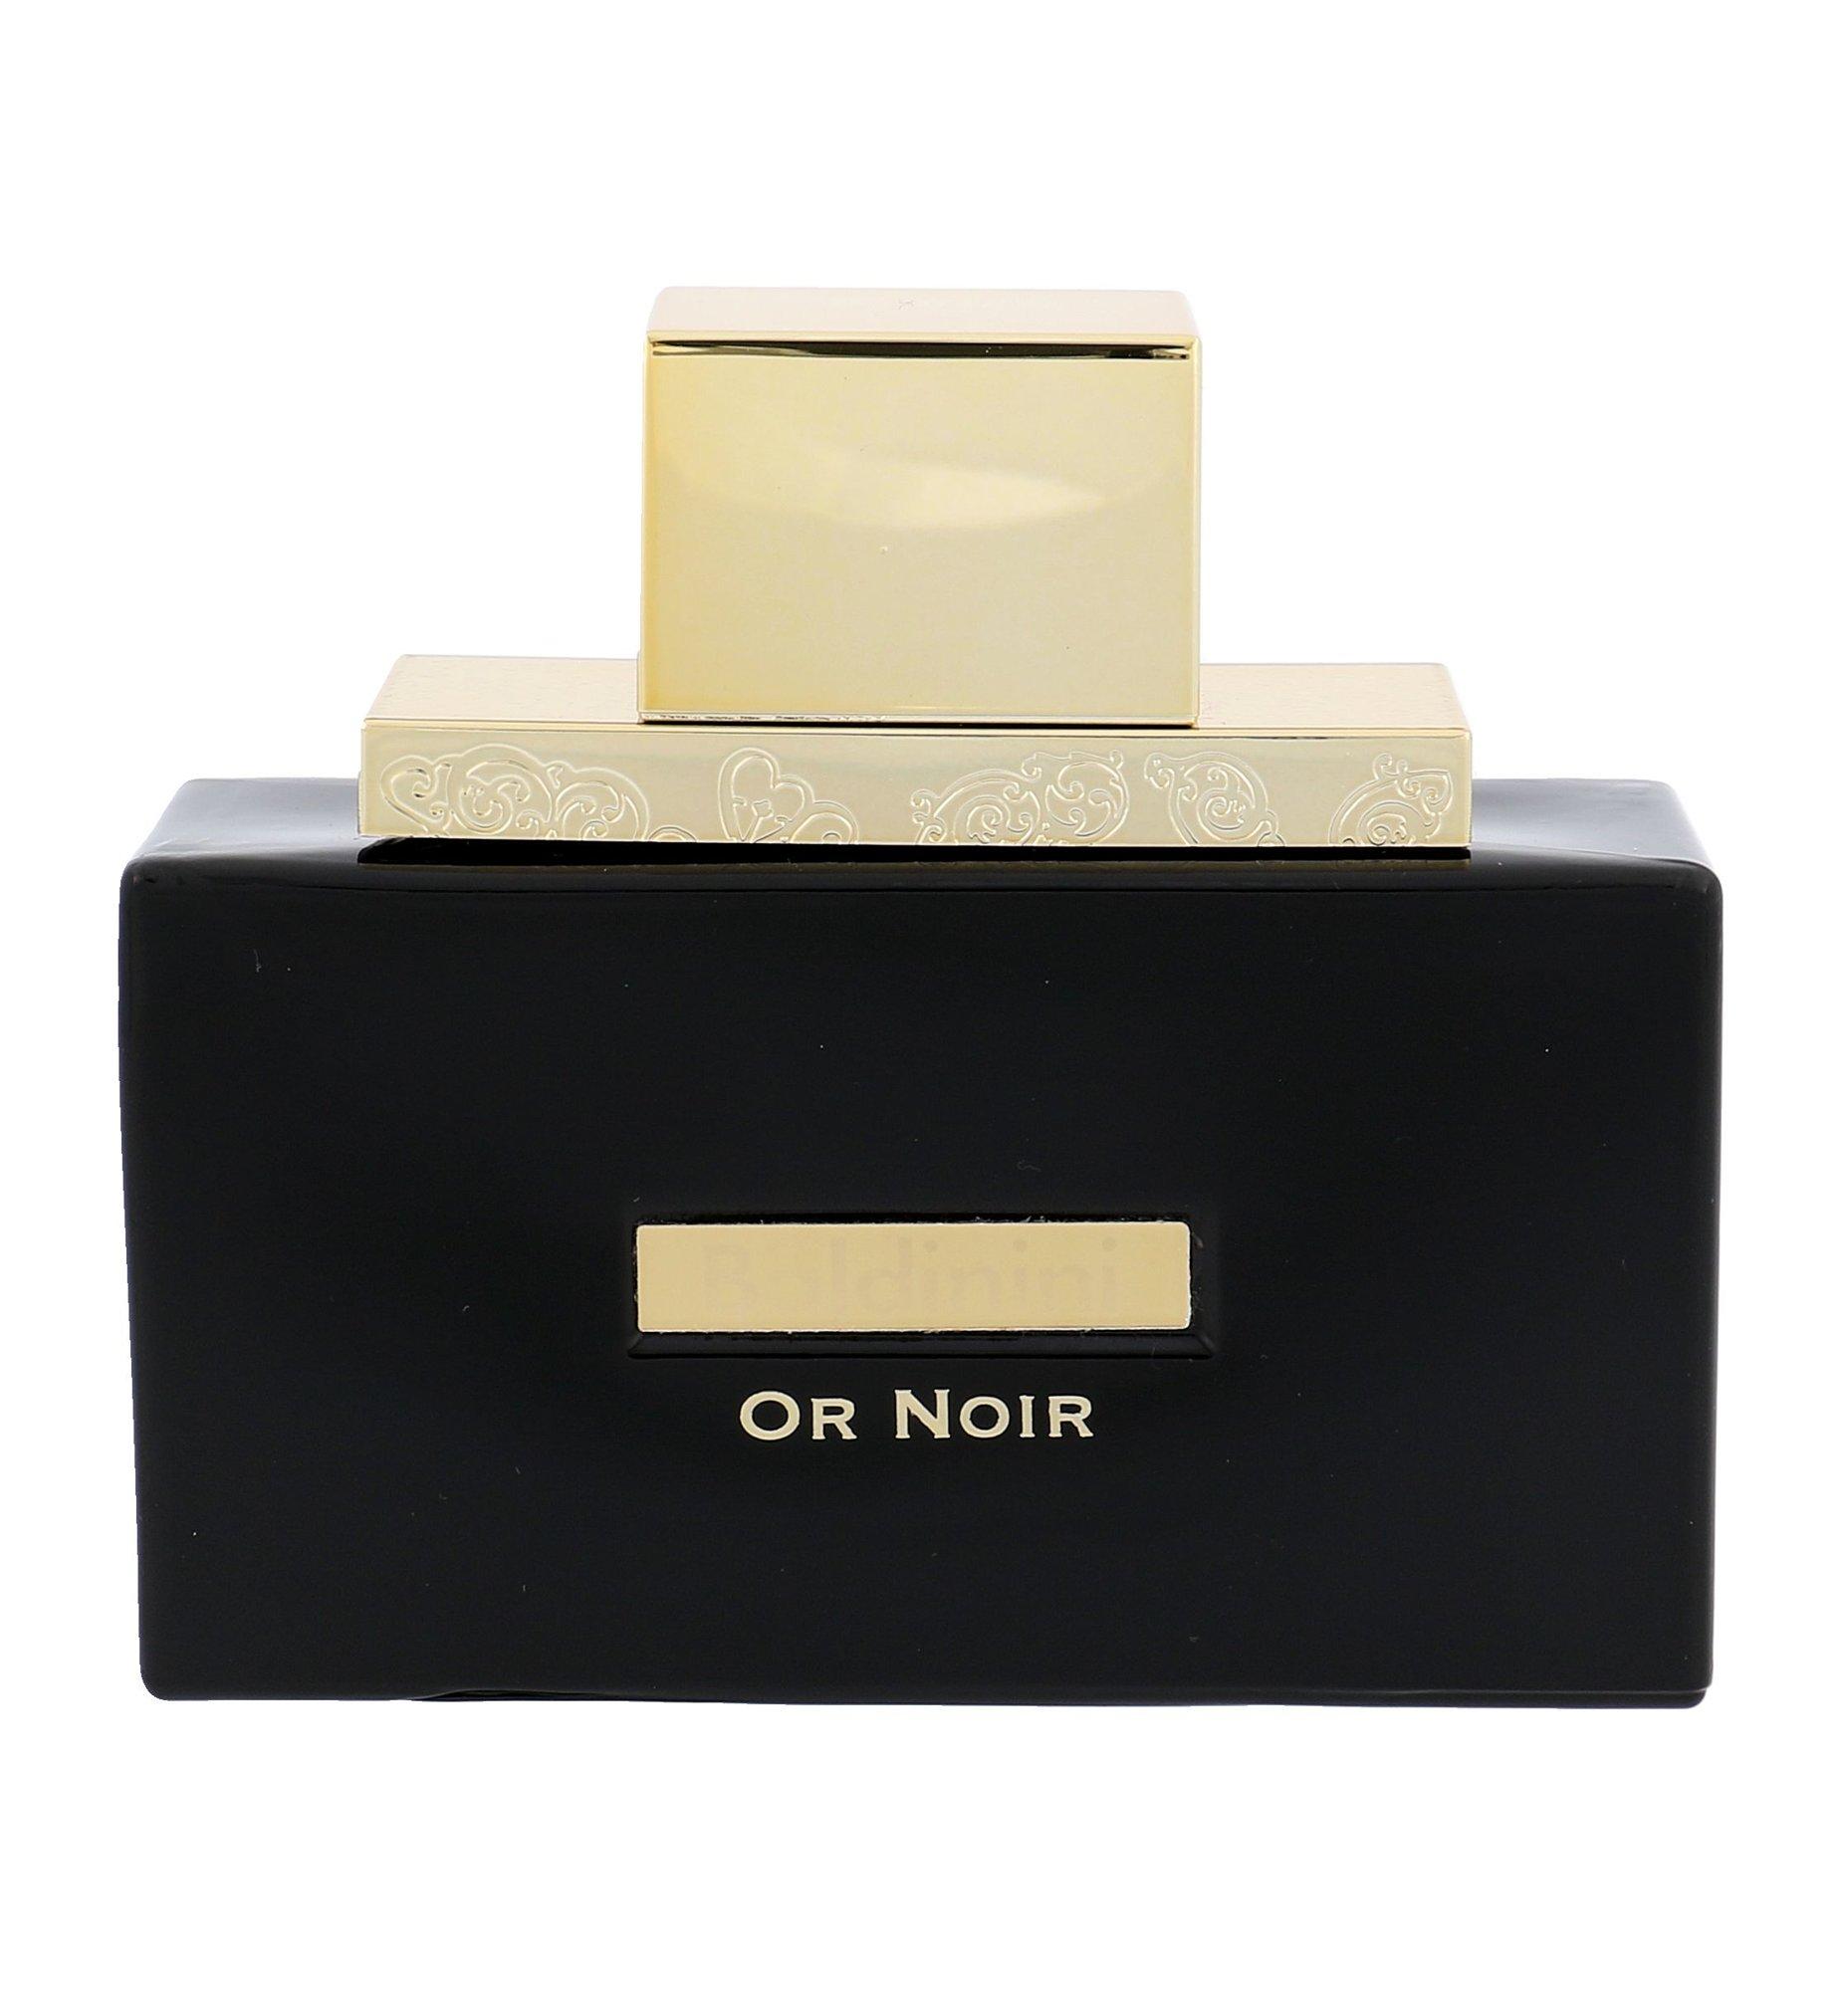 Baldinini Or Noir Eau de Parfum 75ml